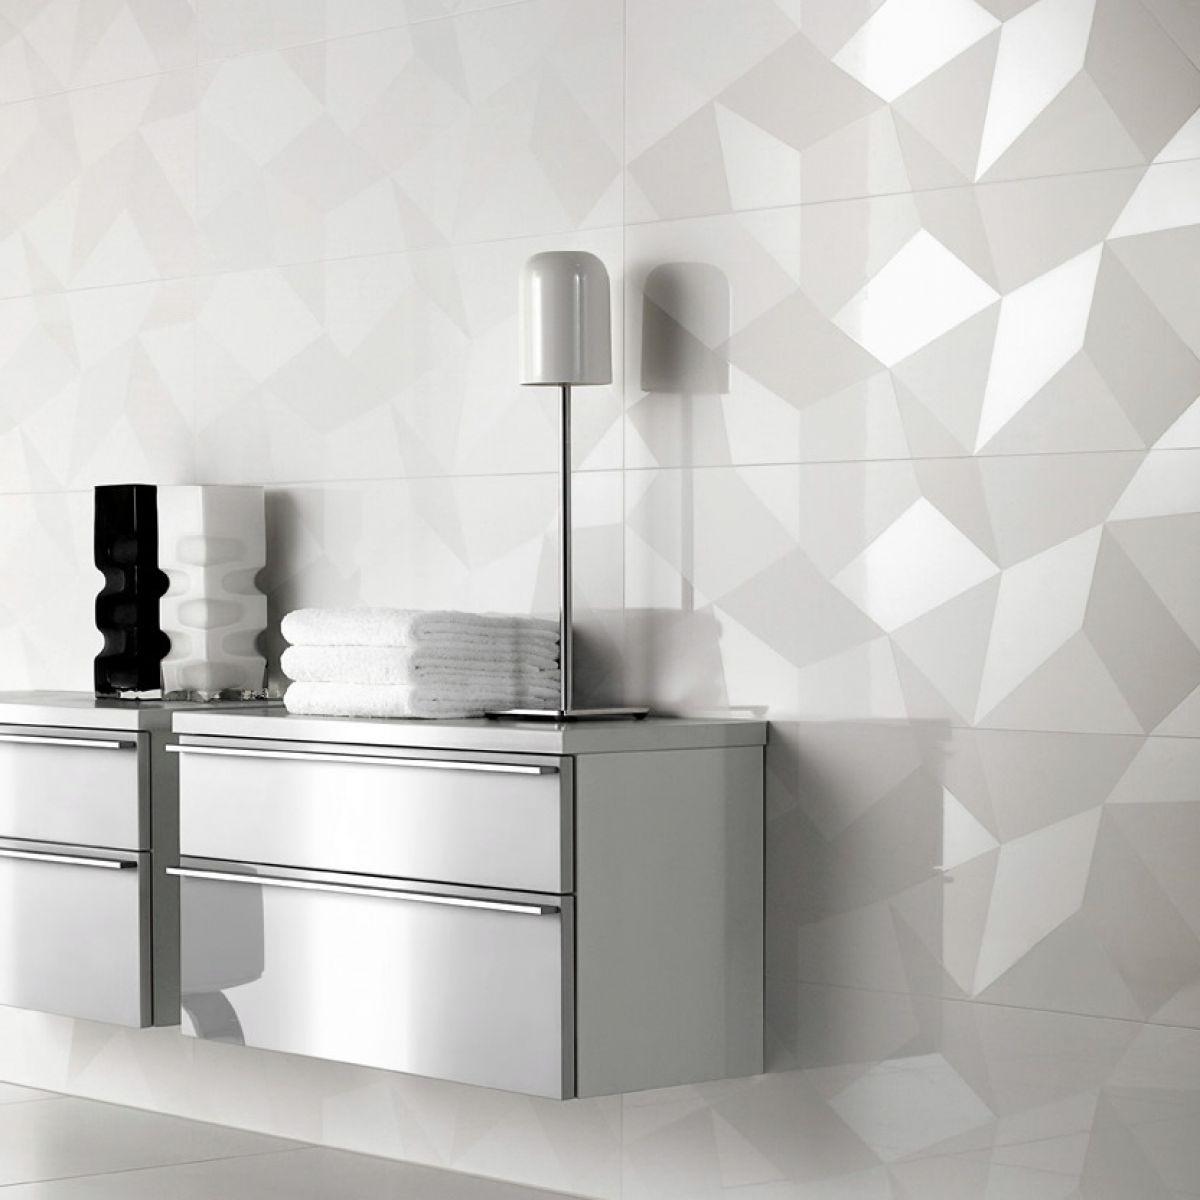 V B Bianco Nero Decor Tile 1581 30 x 60cm UK Bathrooms